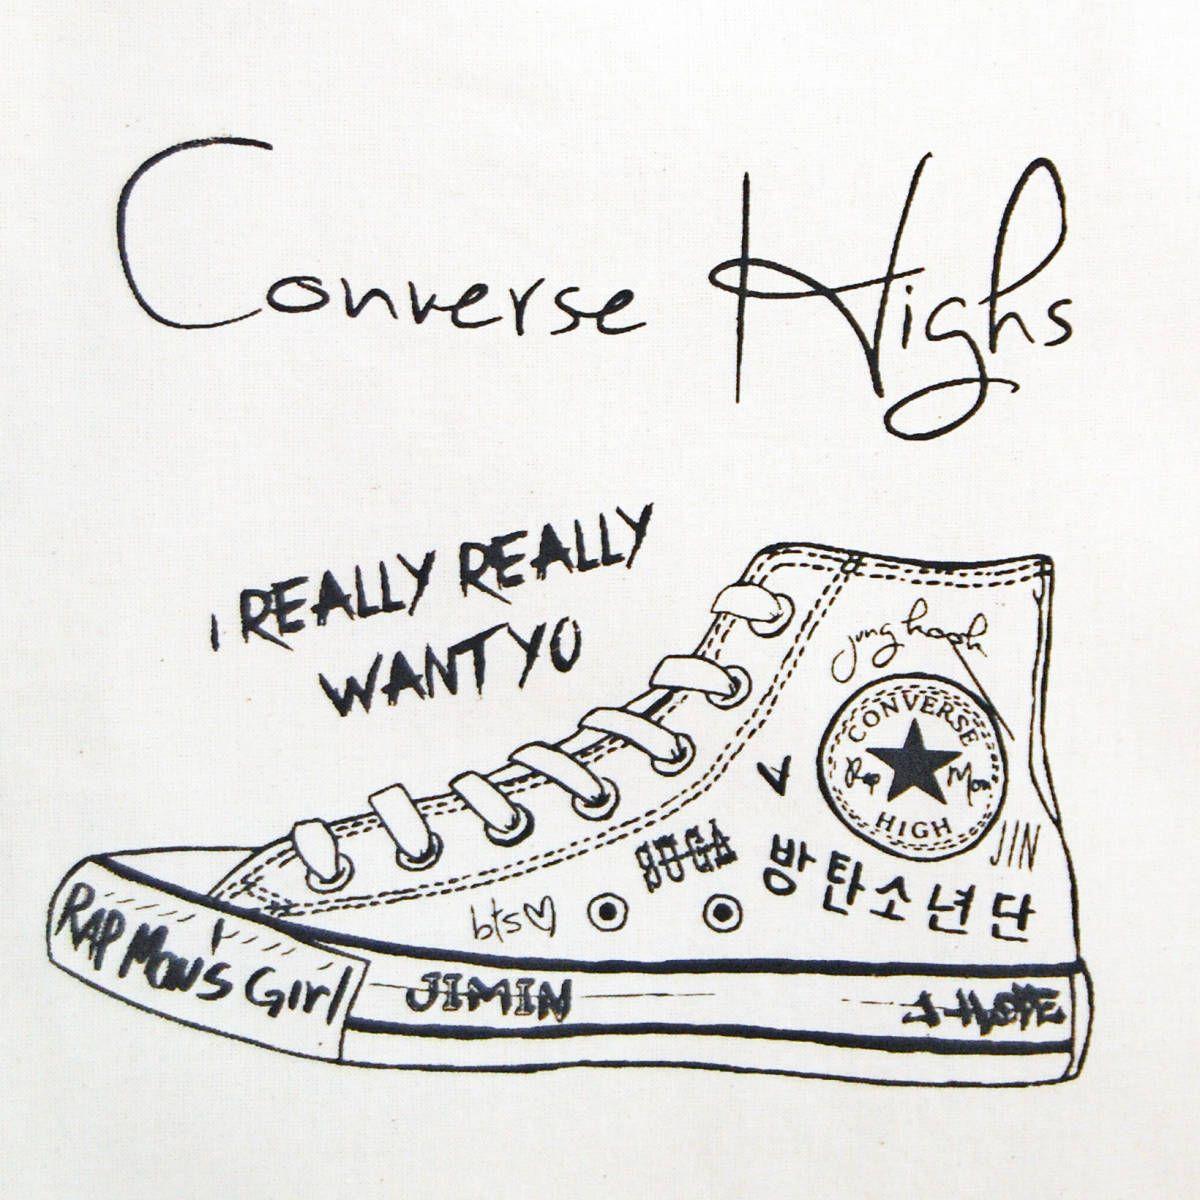 converse bts